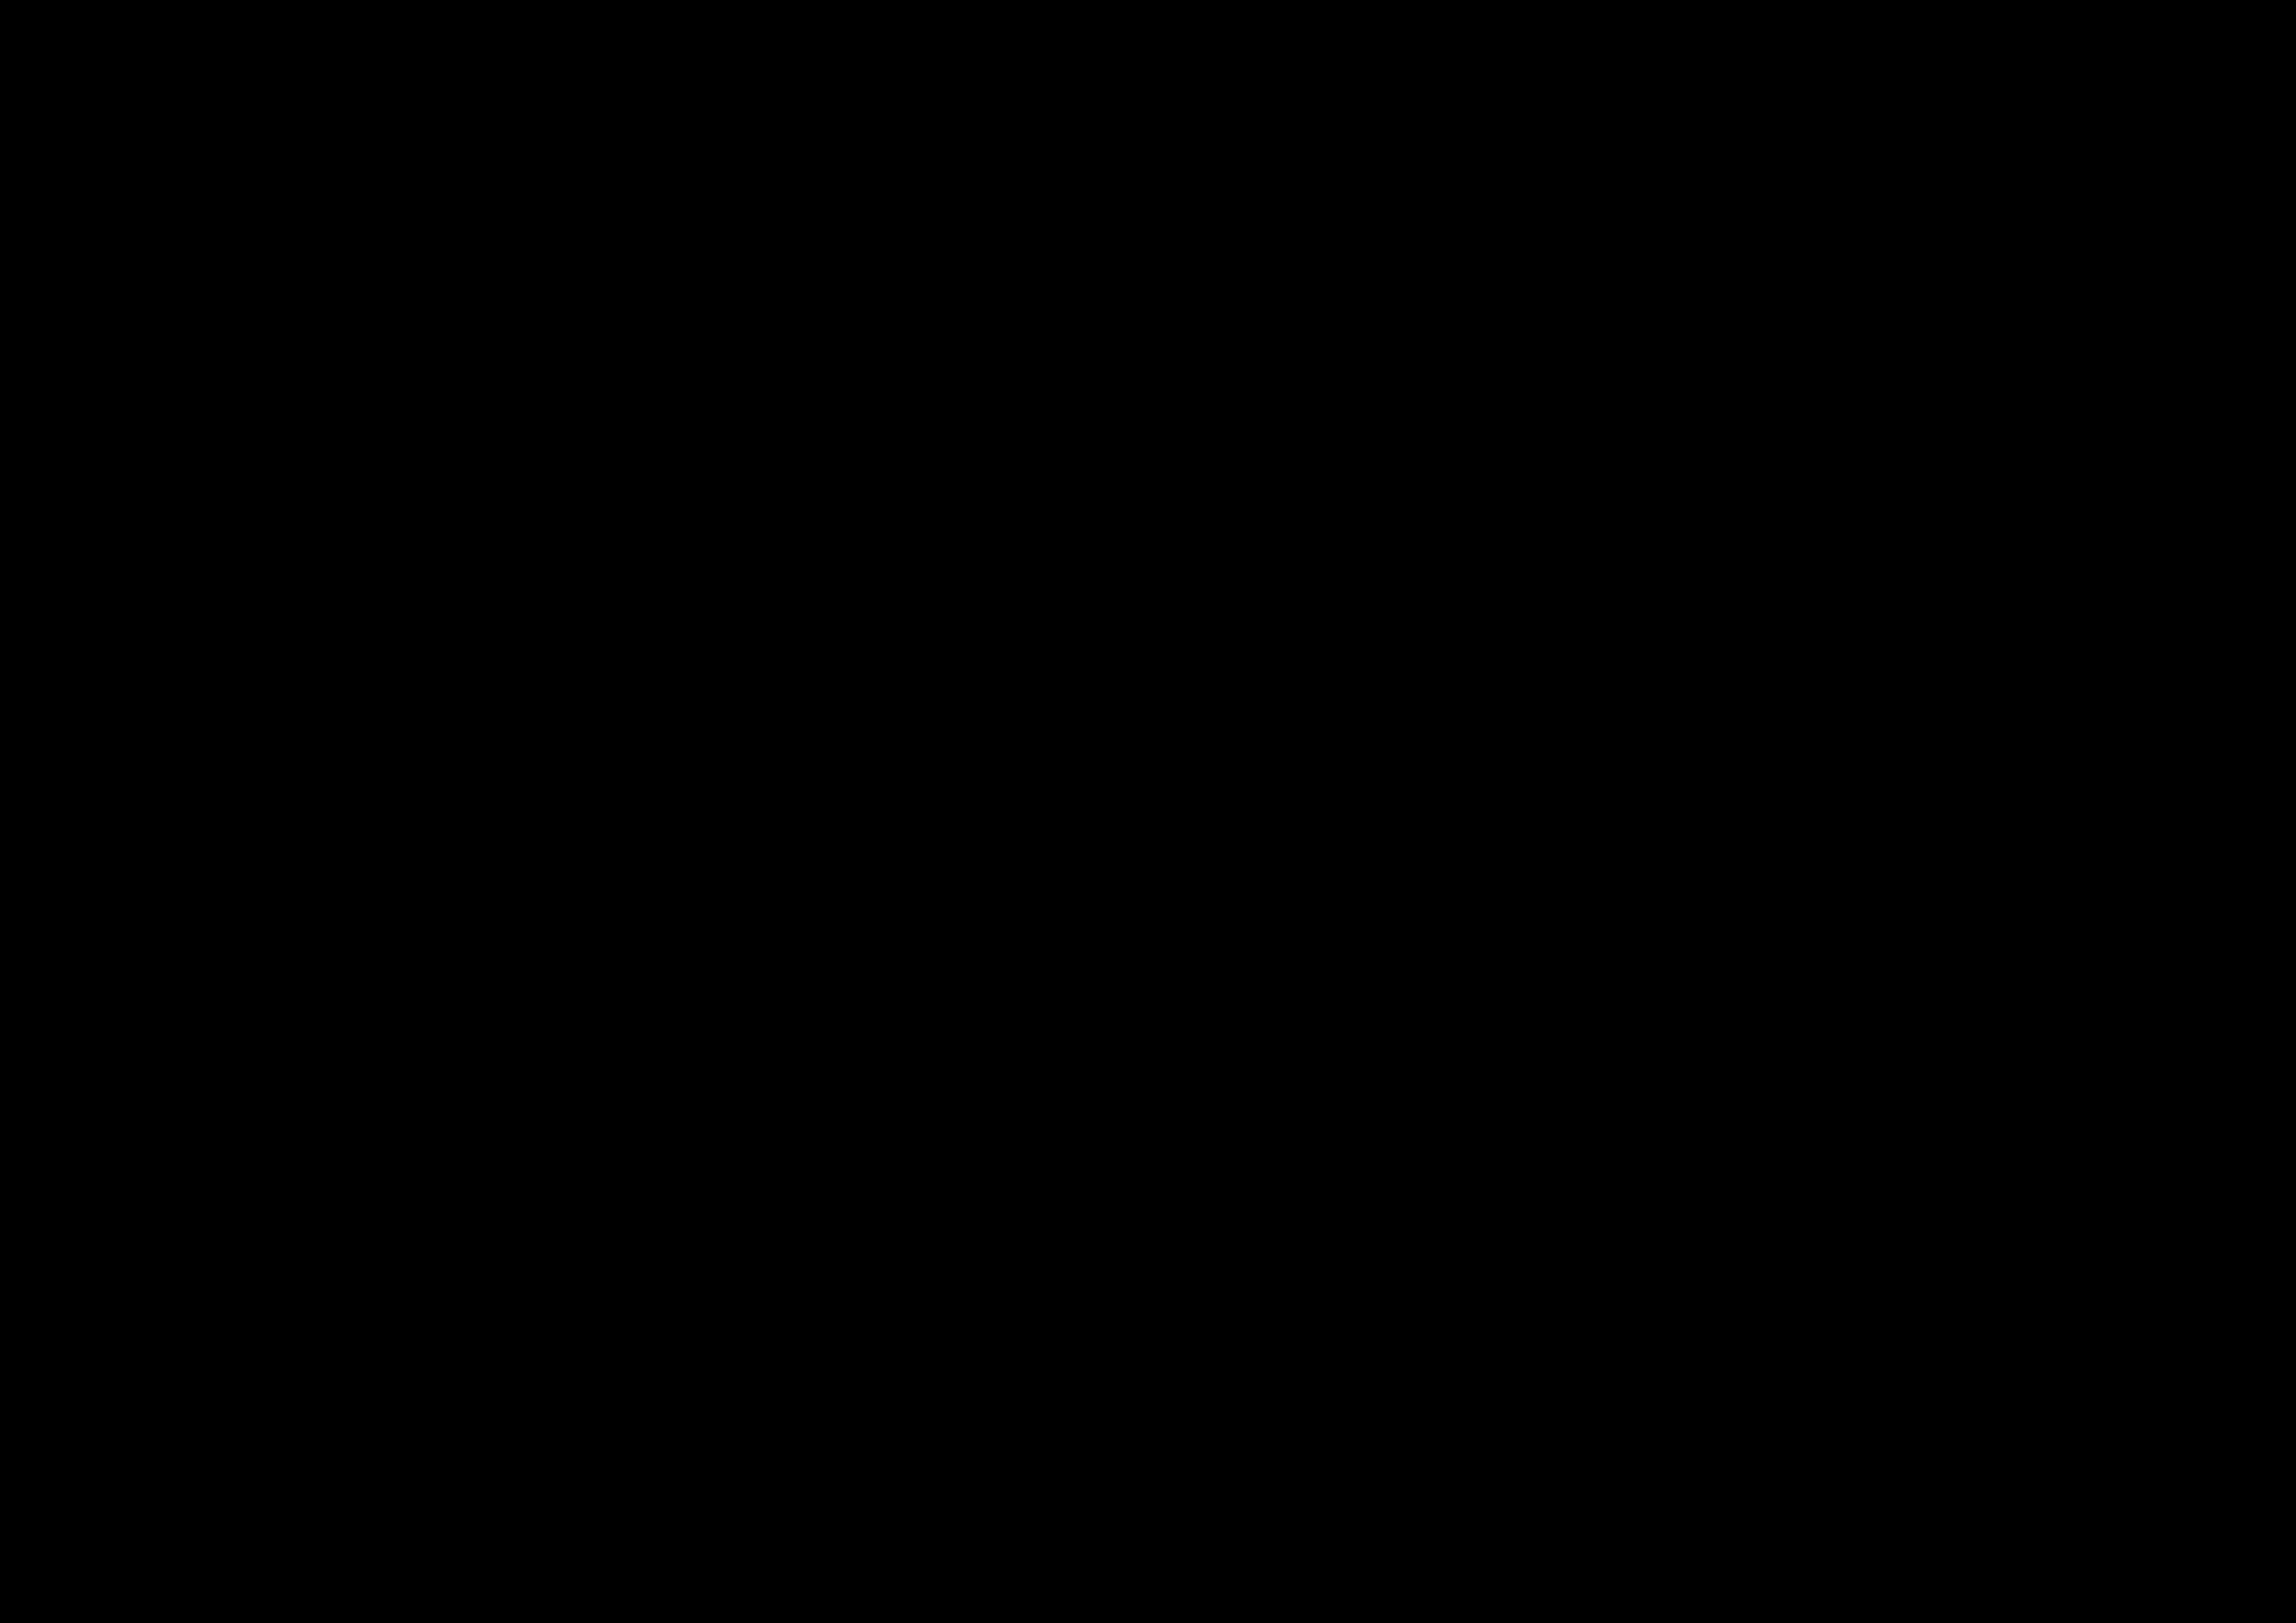 Clipart whale organism. Cute black and white